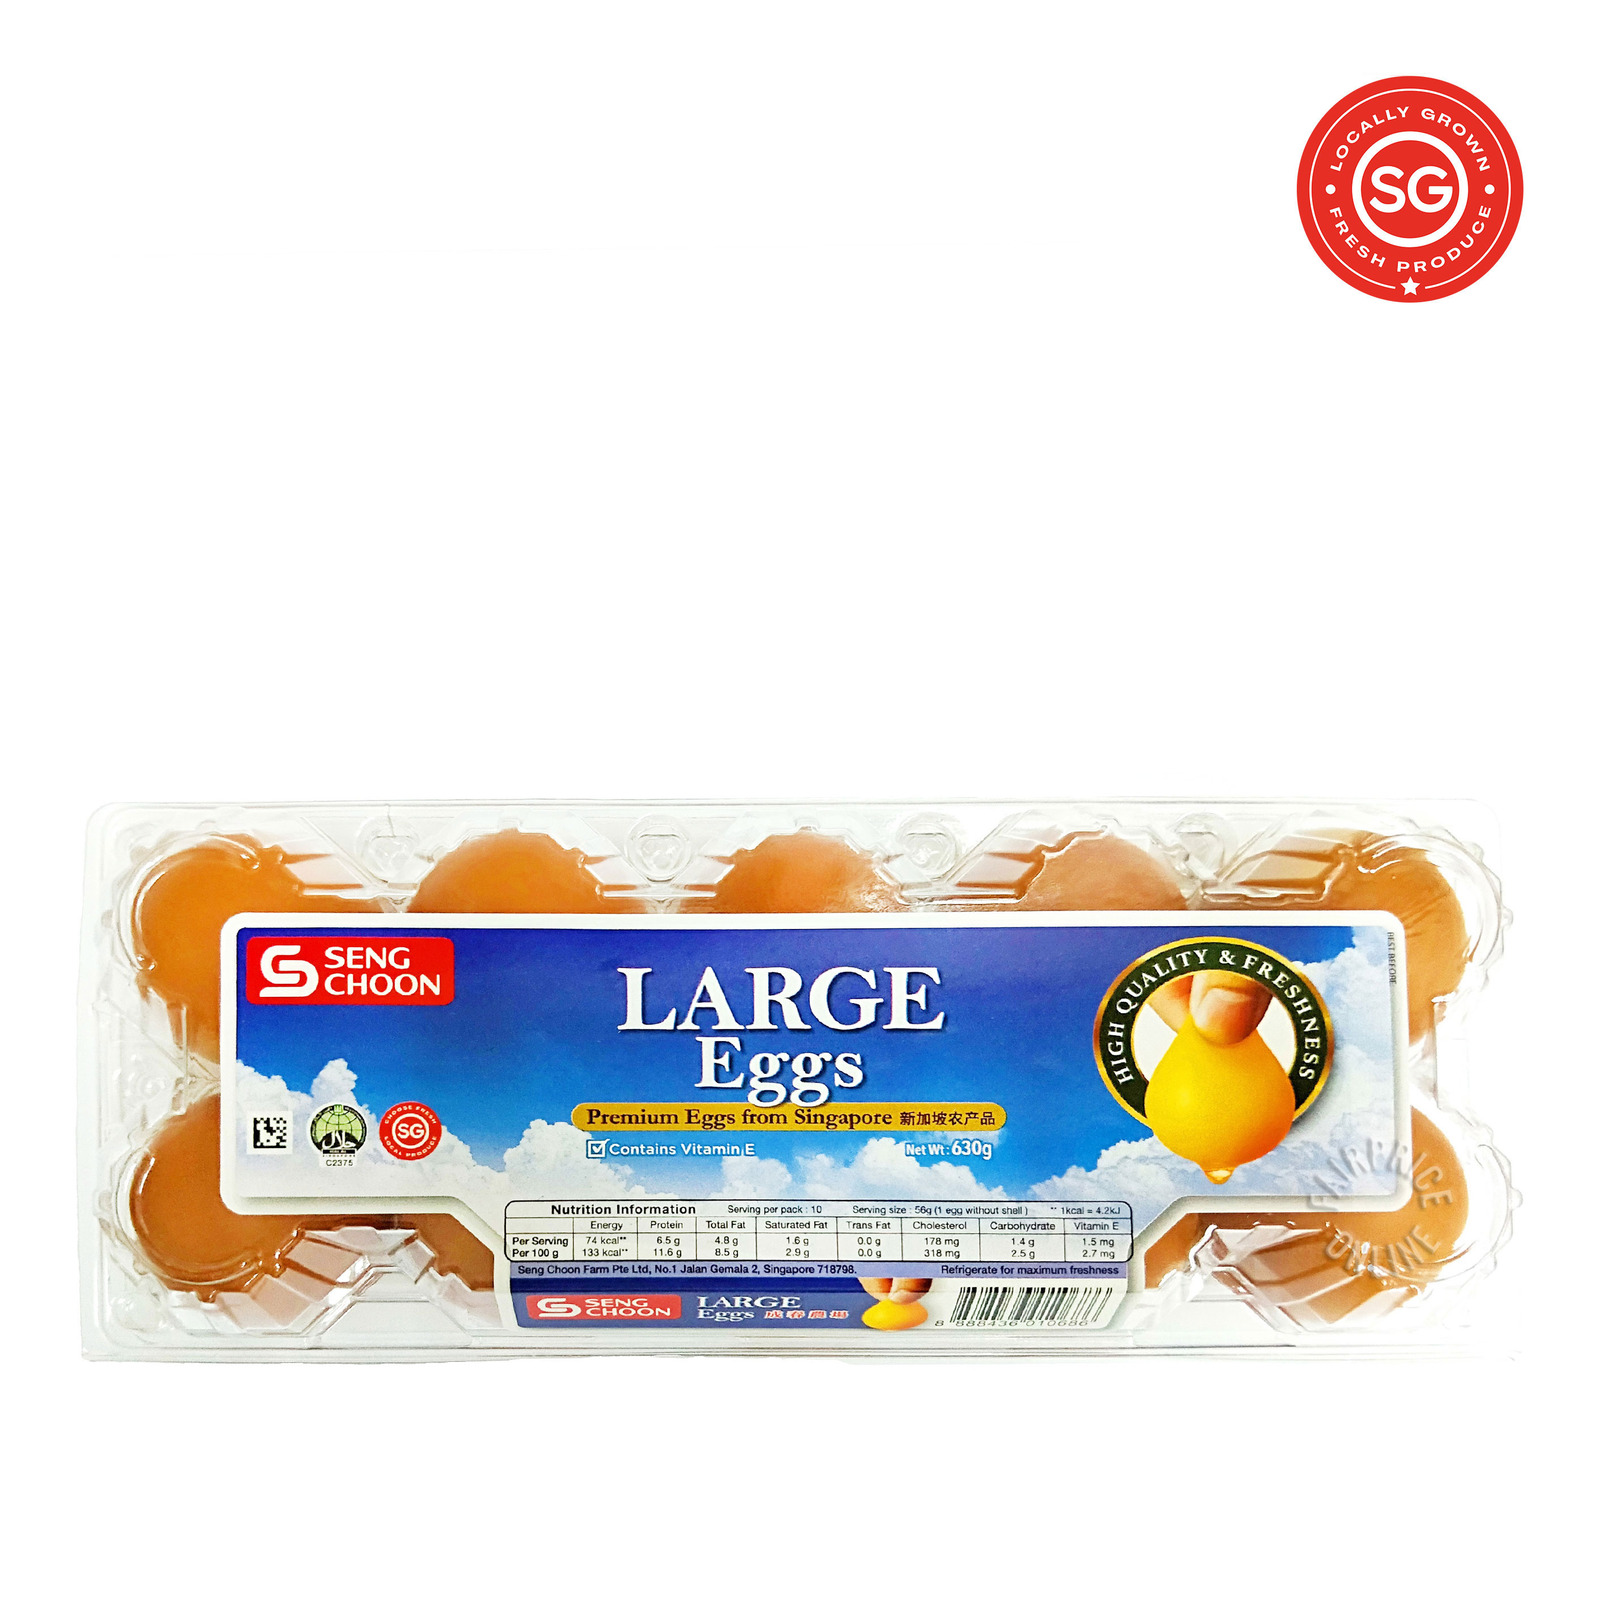 Seng Choon Lower Cholesterol Eggs - Large